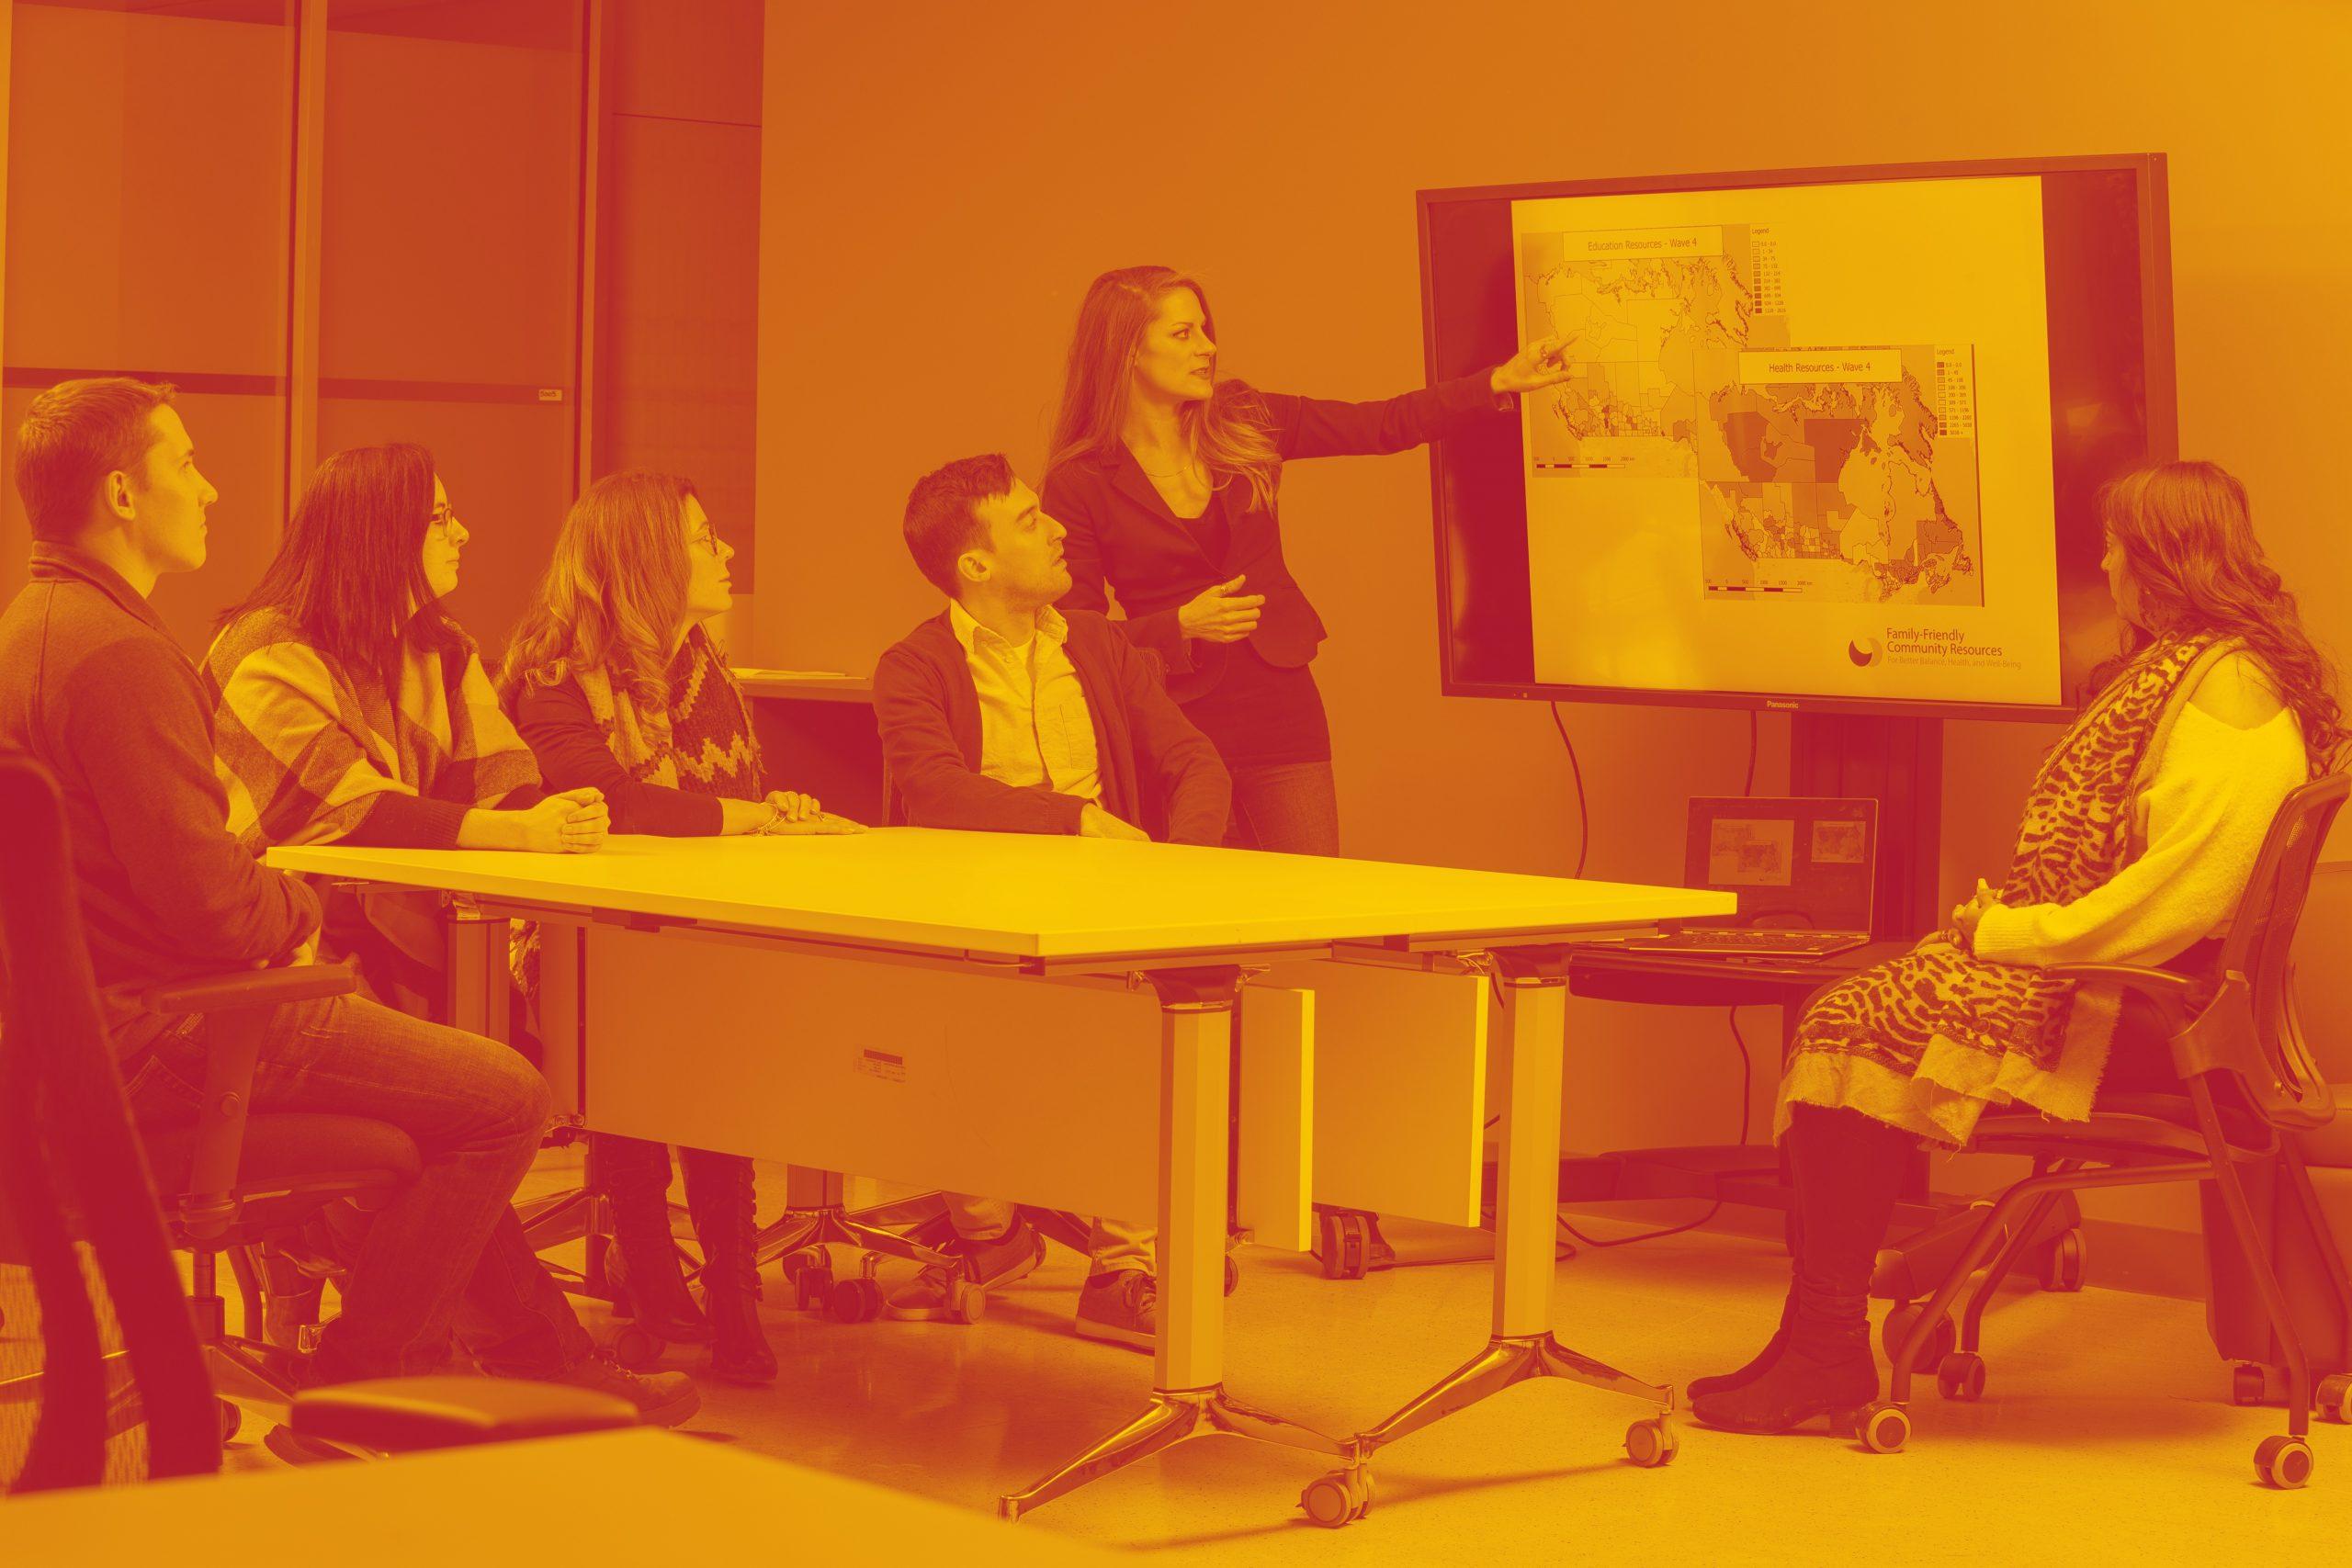 Marisa Young Teaching on Large Screen